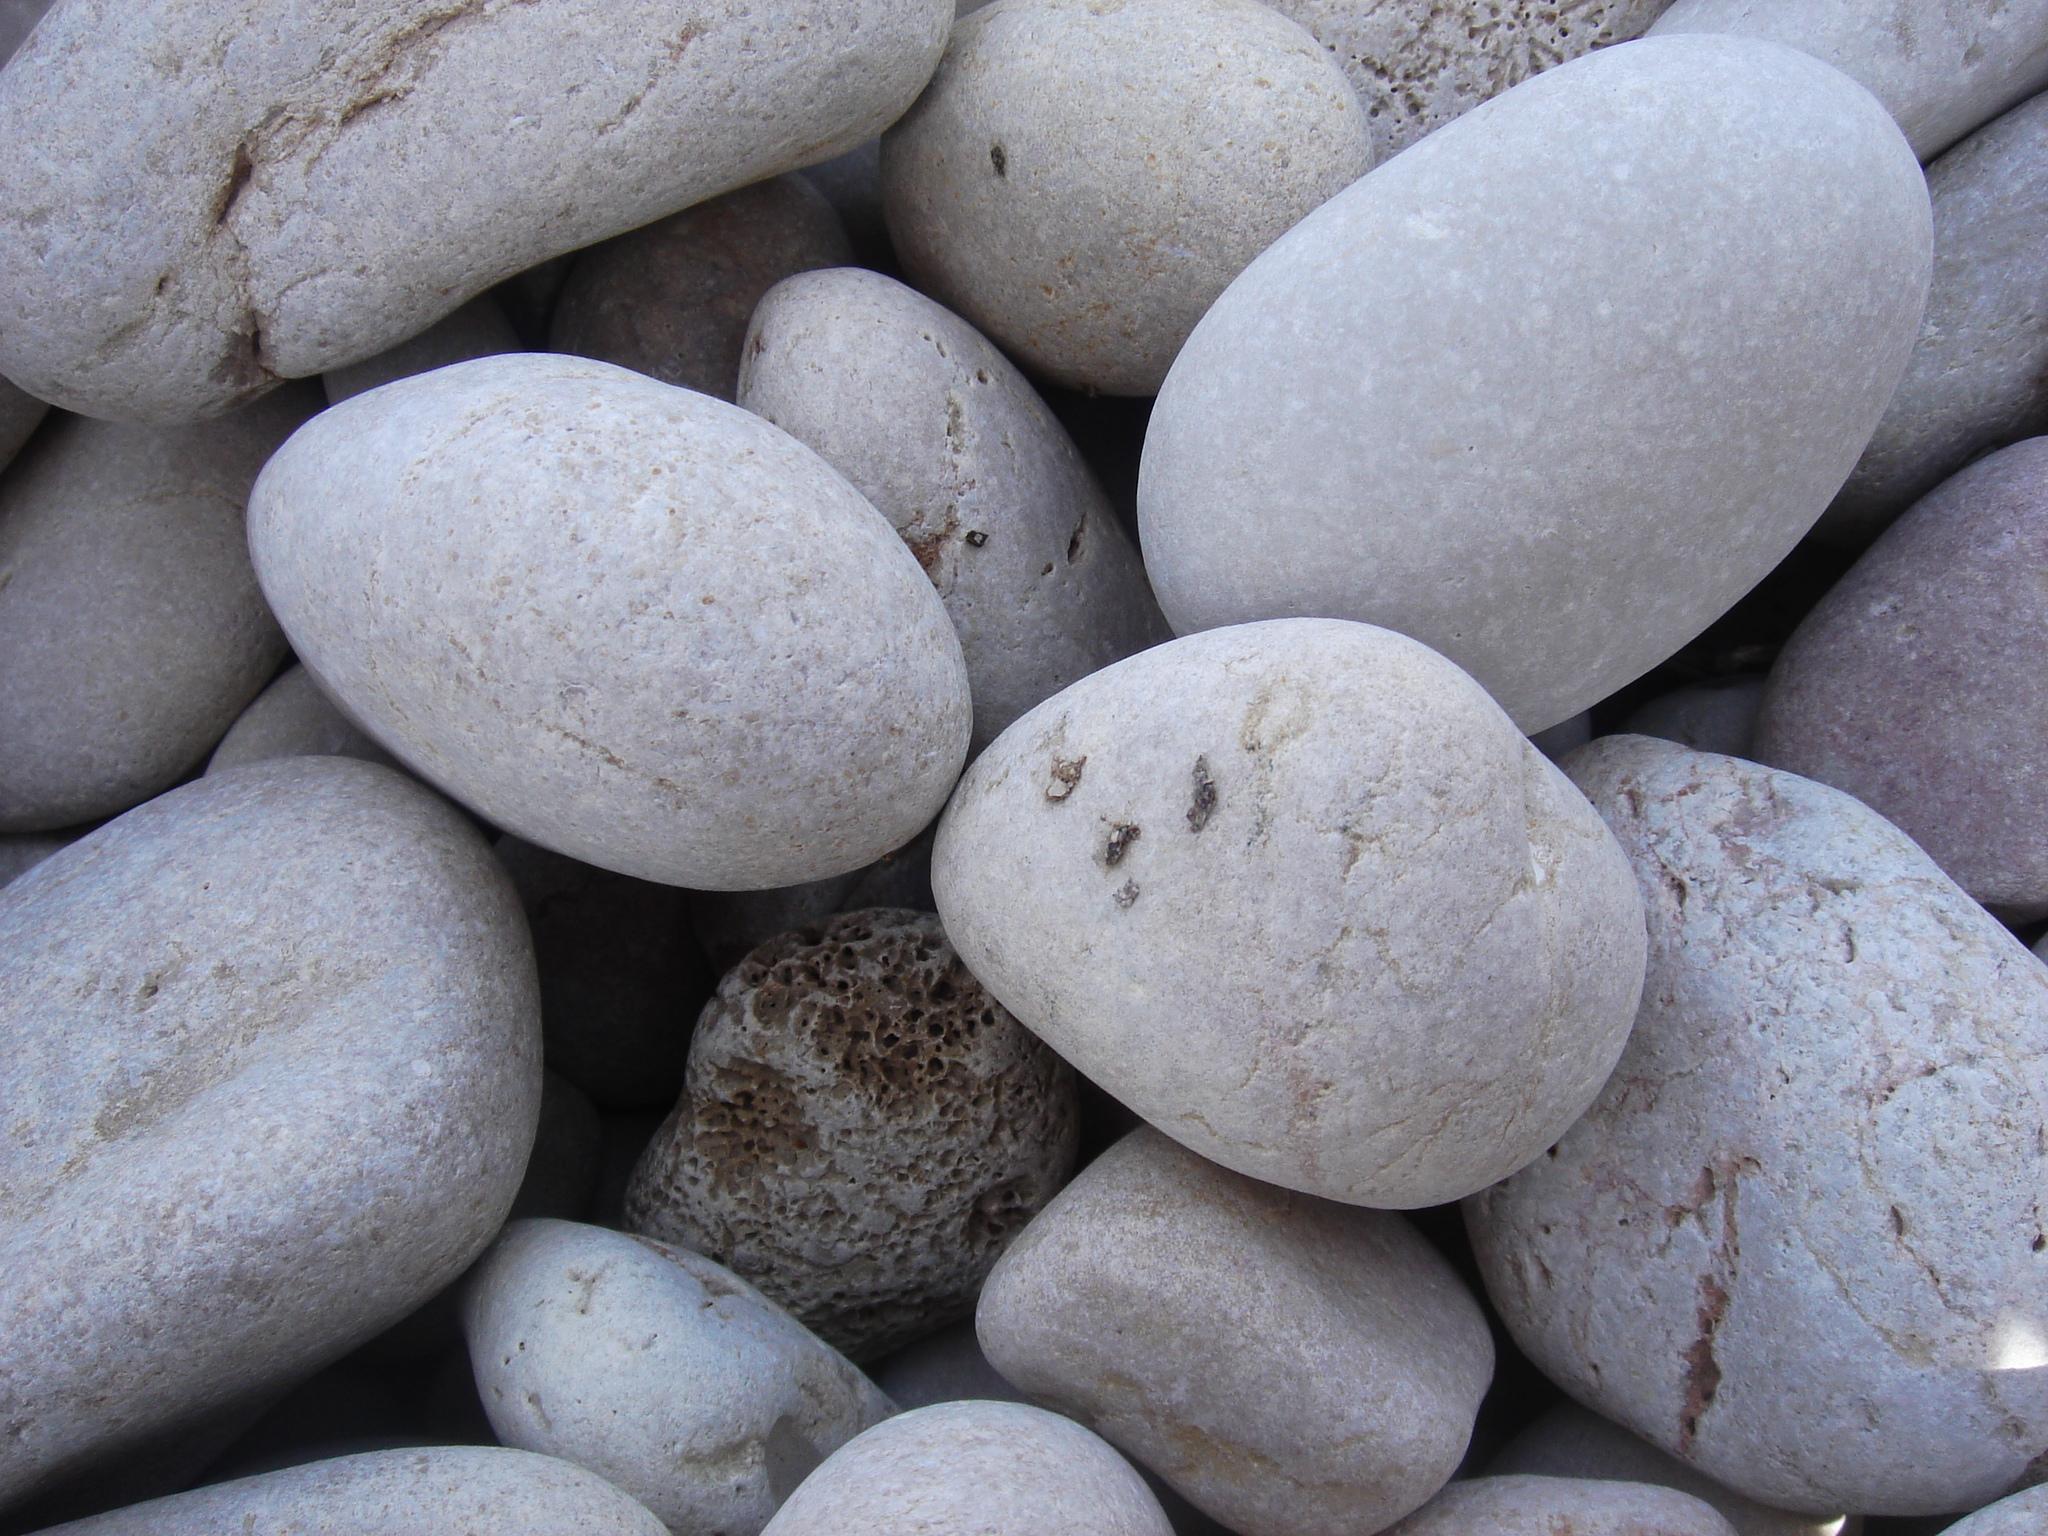 Piedras decoracion bulto kg piedra triturada negra for Piedras pequenas para decorar